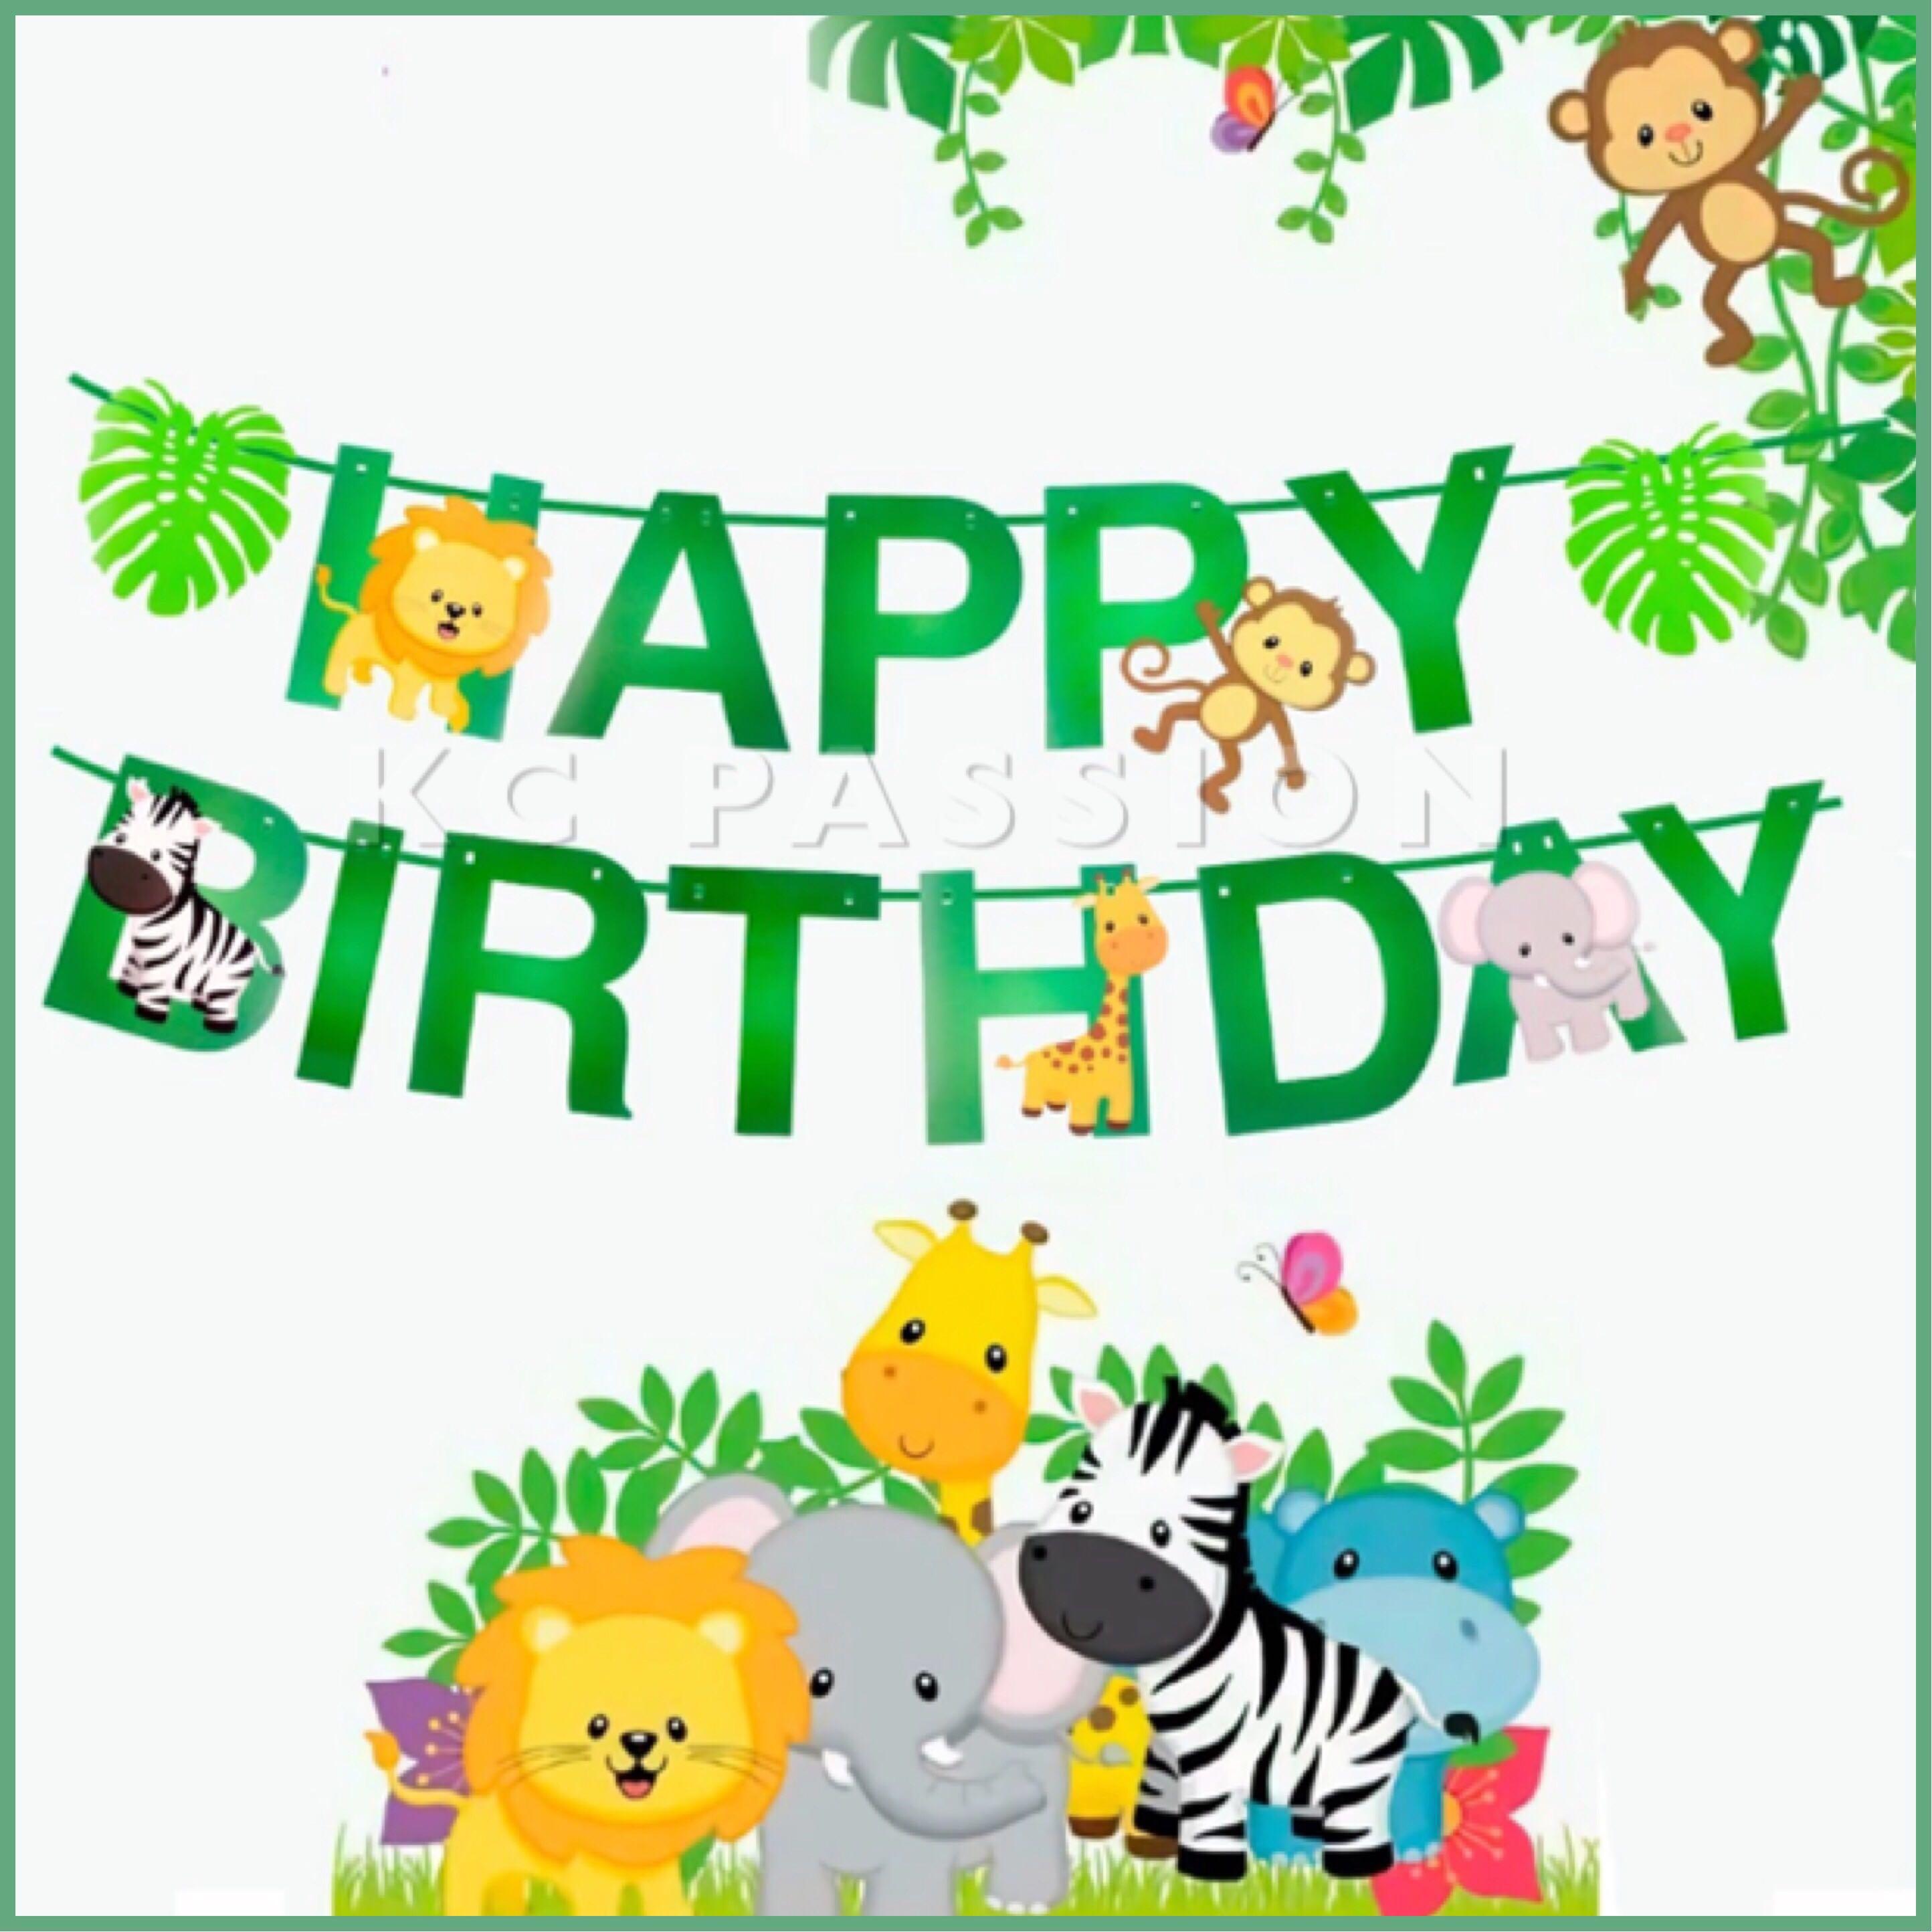 d0048234a 🎉 JUNGLE • ANIMAL • ZOO • SAFARI THEME BIRTHDAY Banner • Flag ...